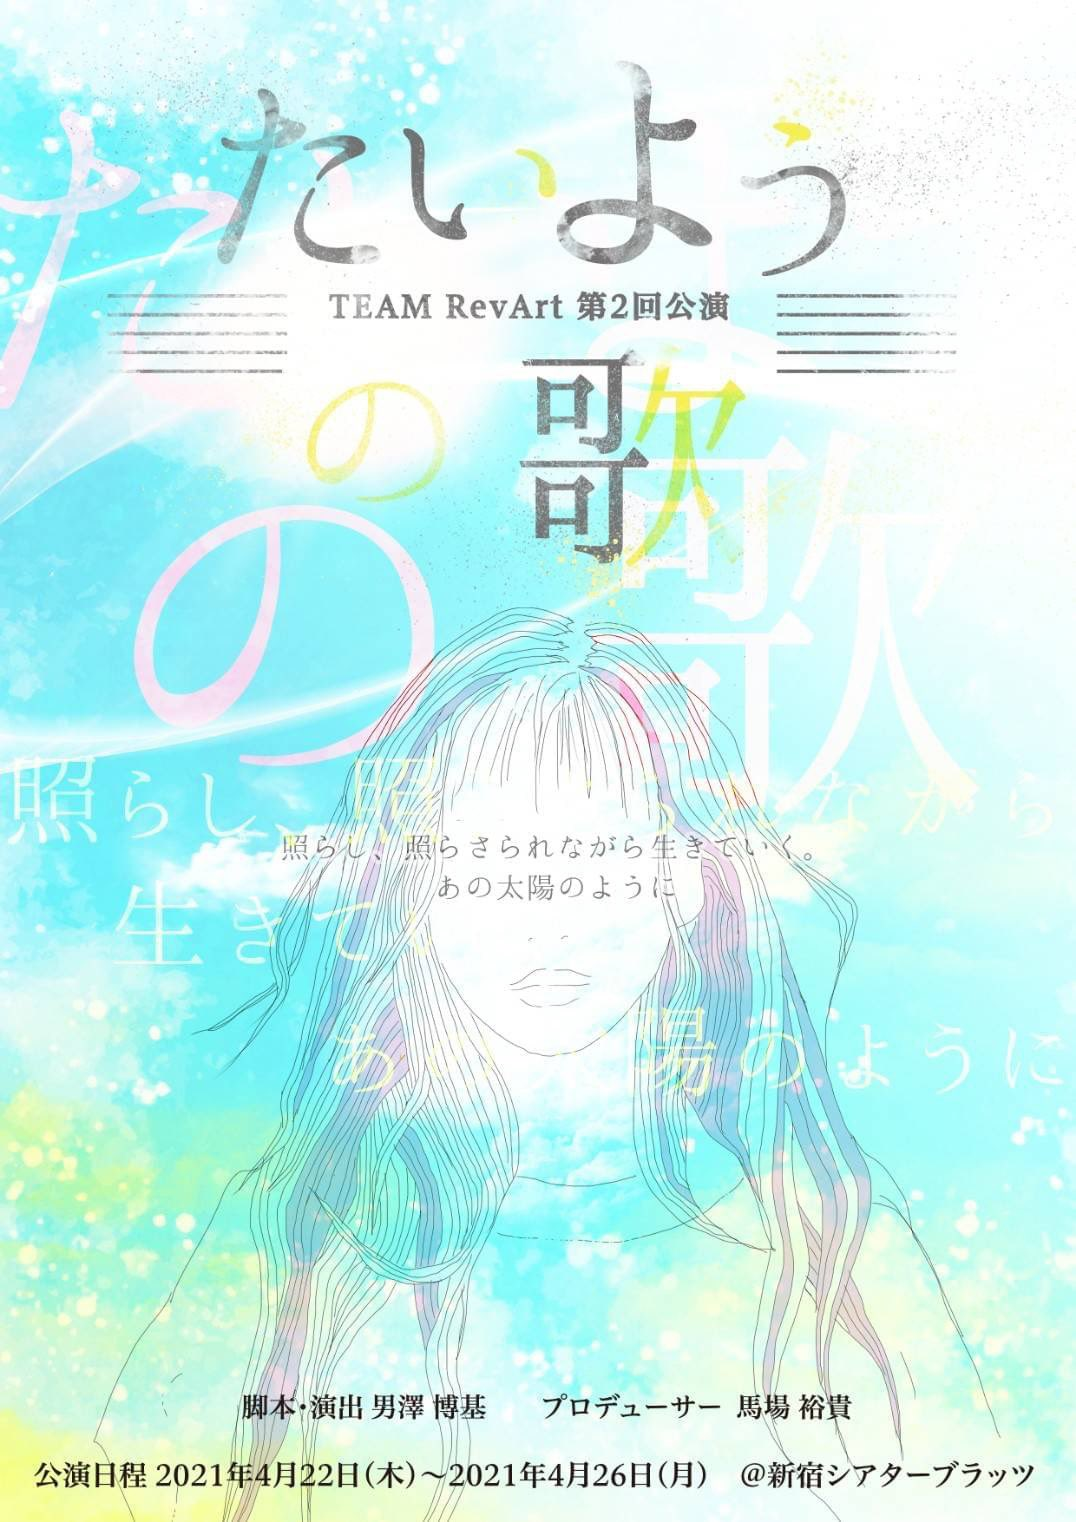 TEAM RevArt 第2回公演  たいようの歌 4/26 12:00 A班